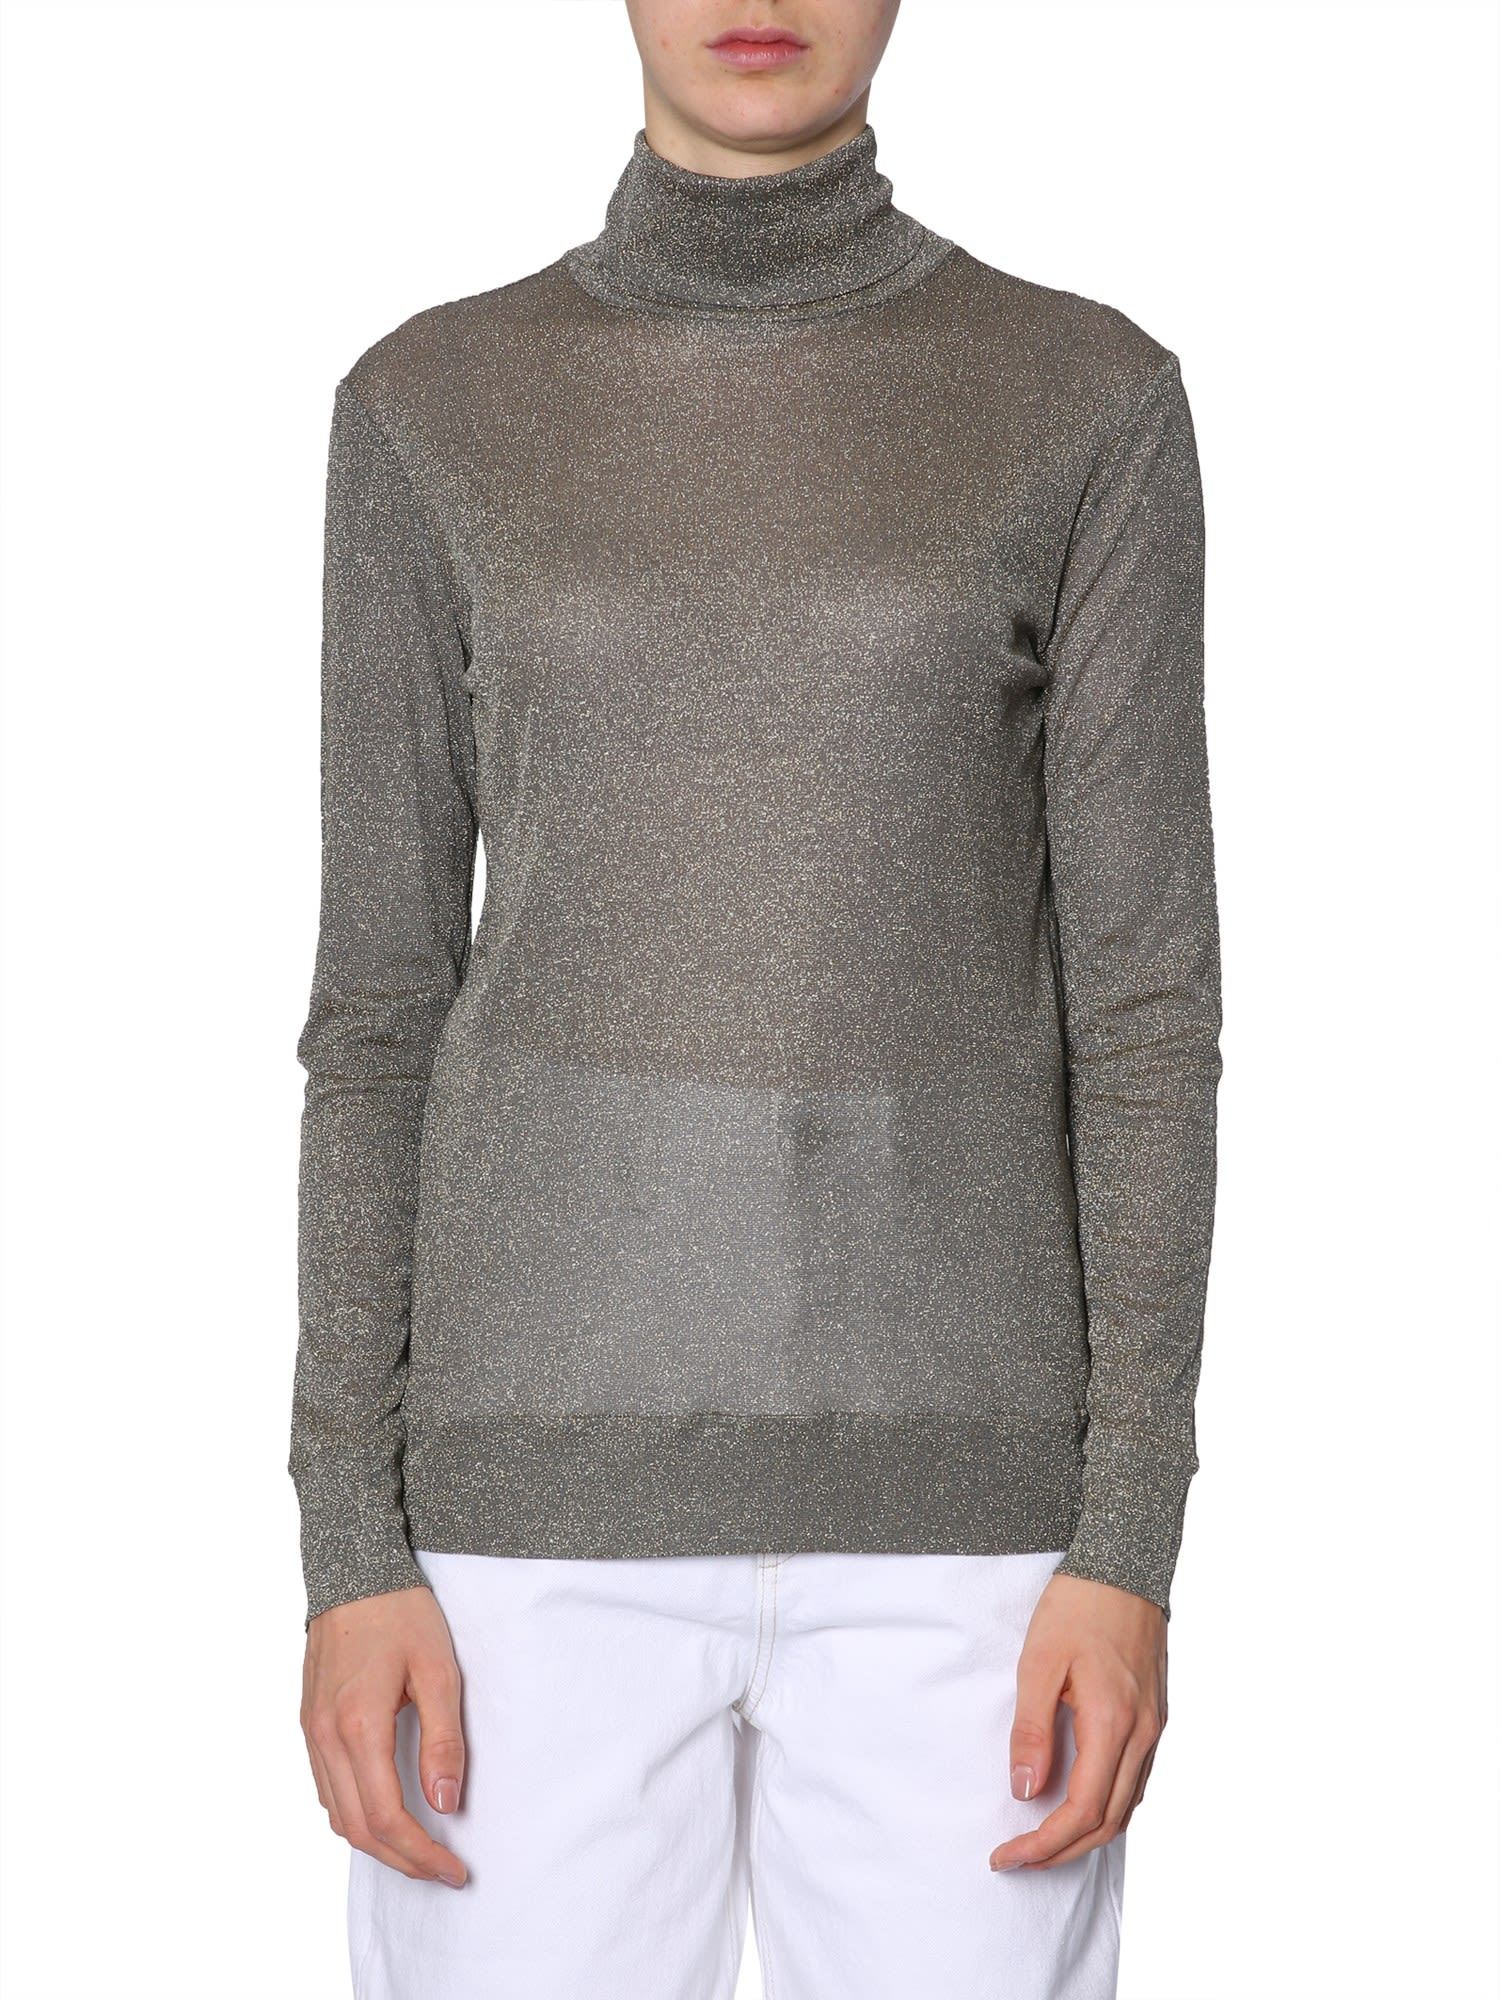 Fabiana Filippi Fabiana Filippi Viscose And Lurex T-shirts